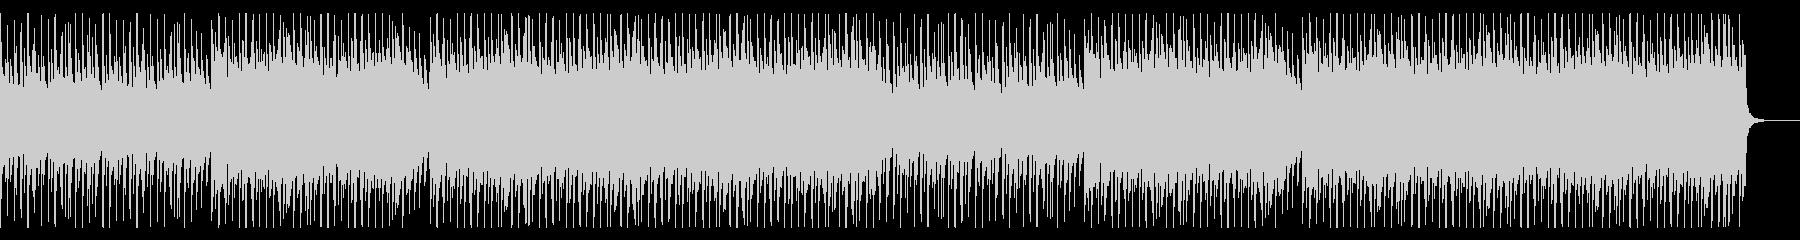 No strings Tetsukoto WIND Refreshing's unreproduced waveform